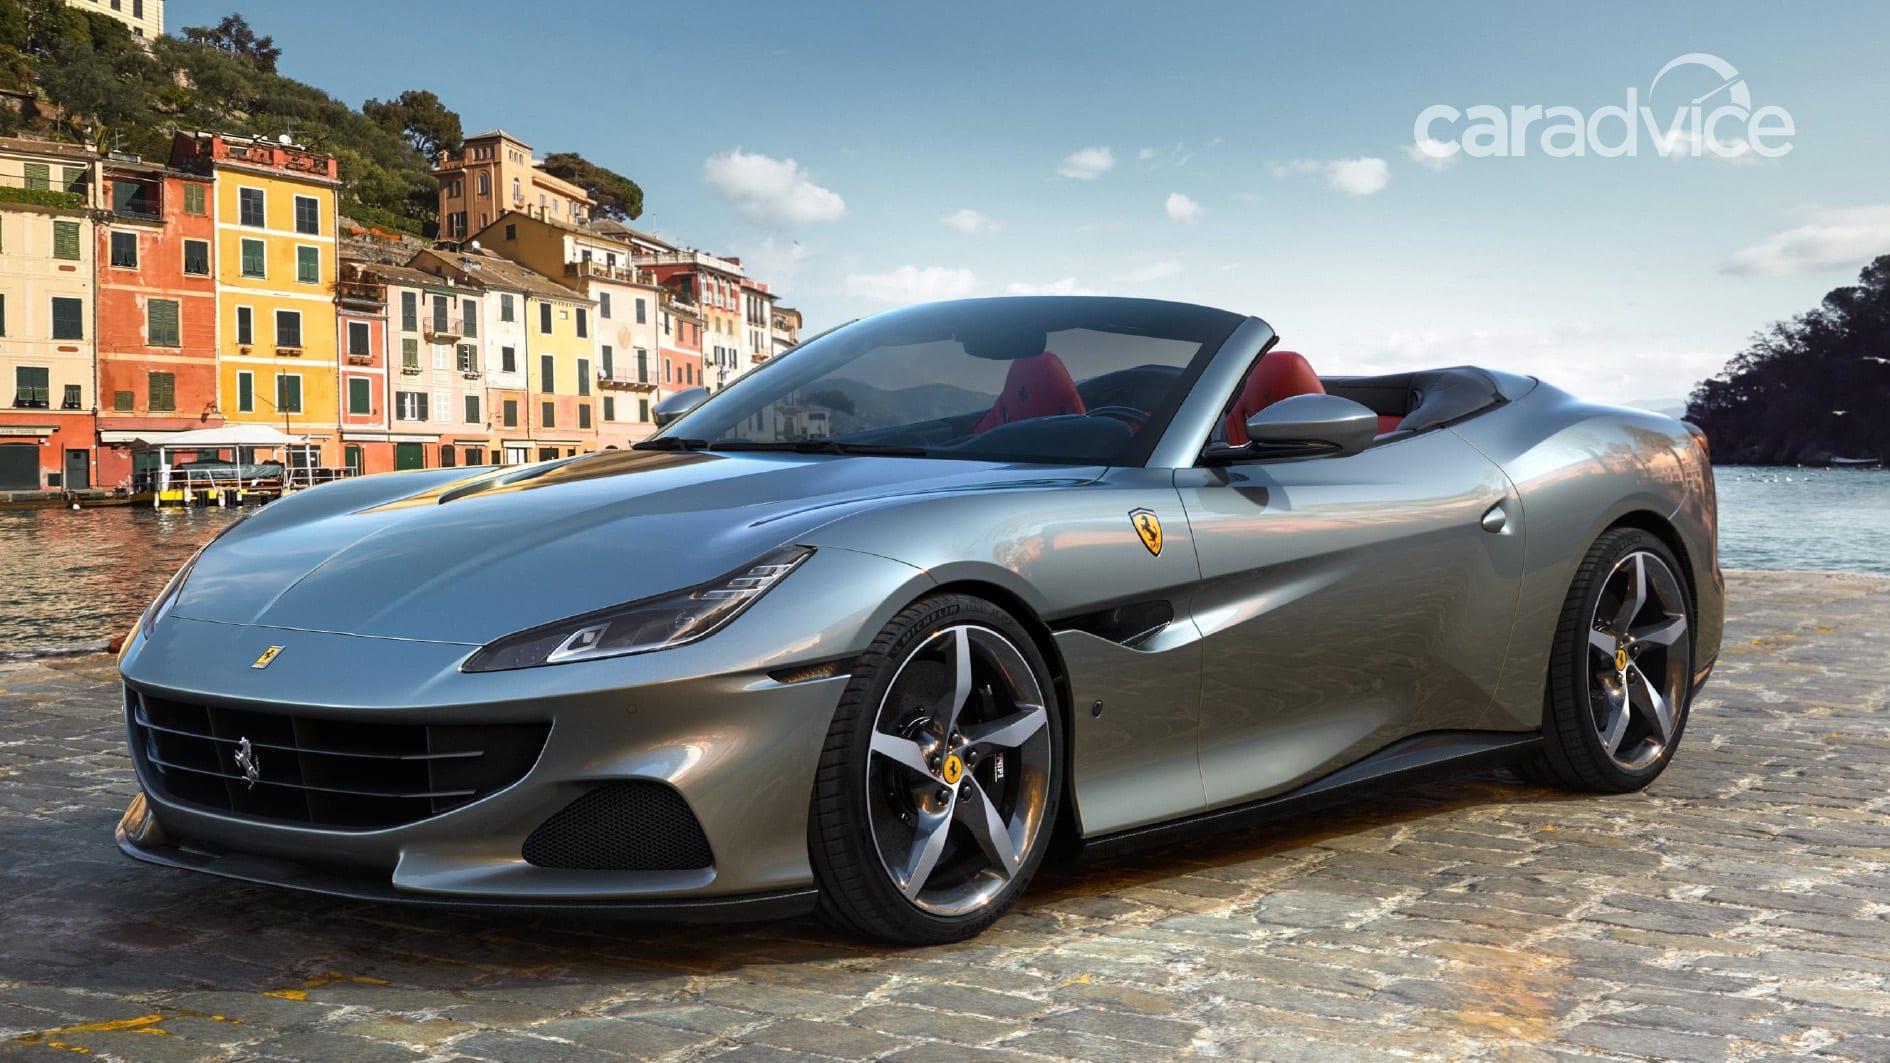 2021 ferrari portofino m revealed: entry-level convertible